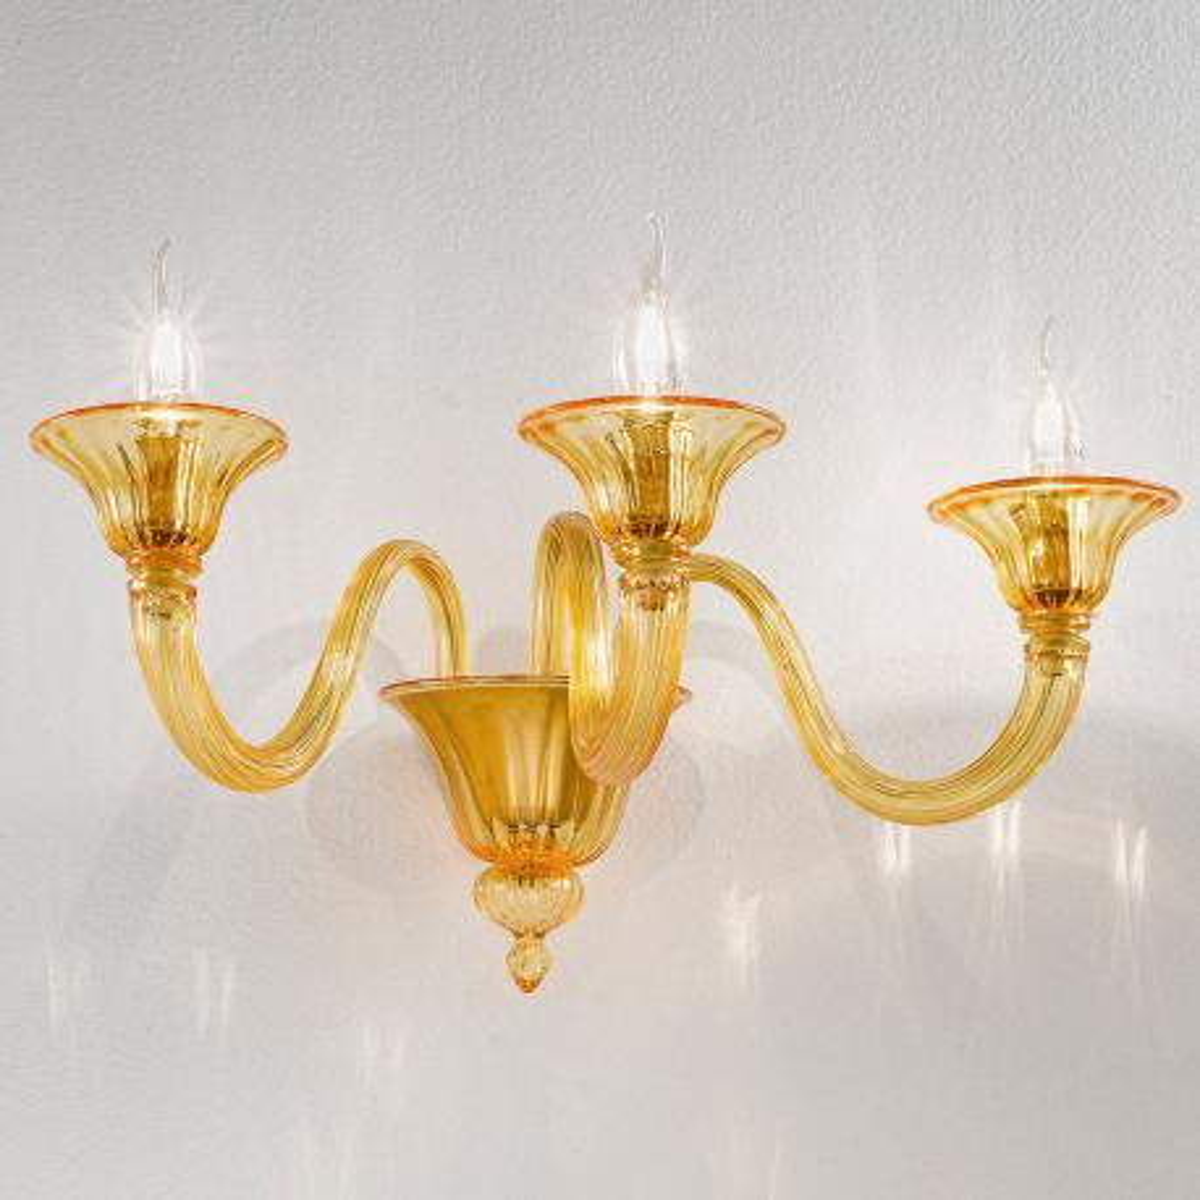 """Paola"" Murano glass sconce - 3 lights - amber"